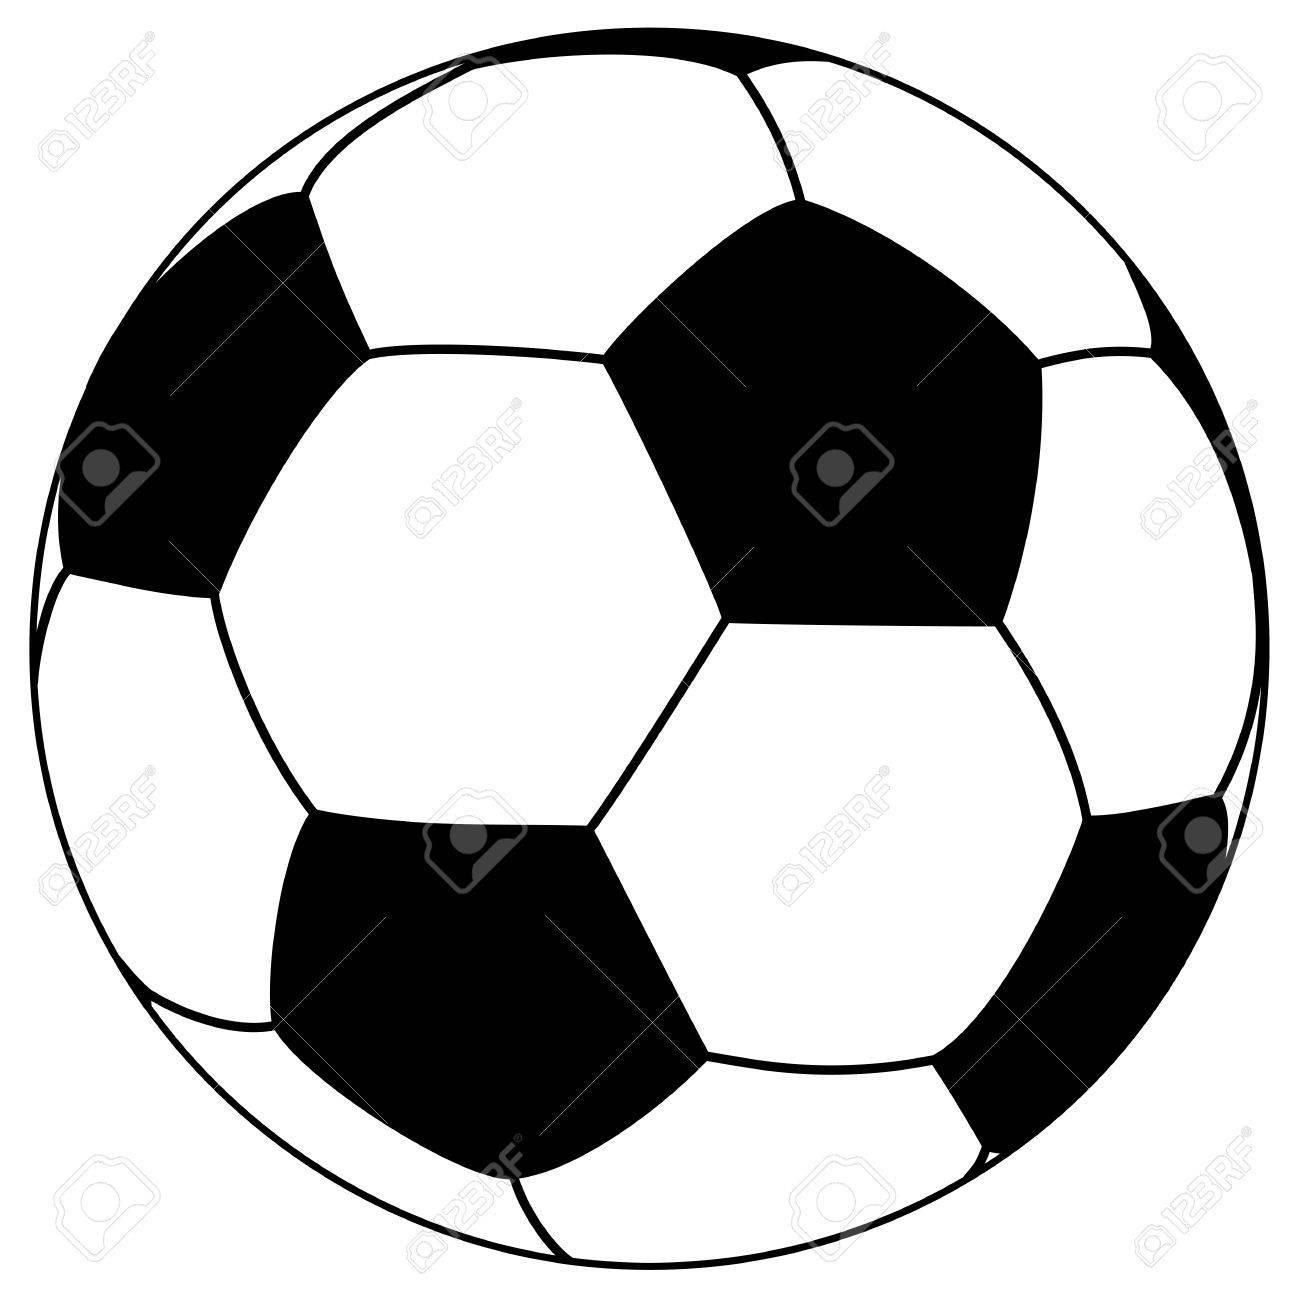 Black White Football Simple Vector Illustration